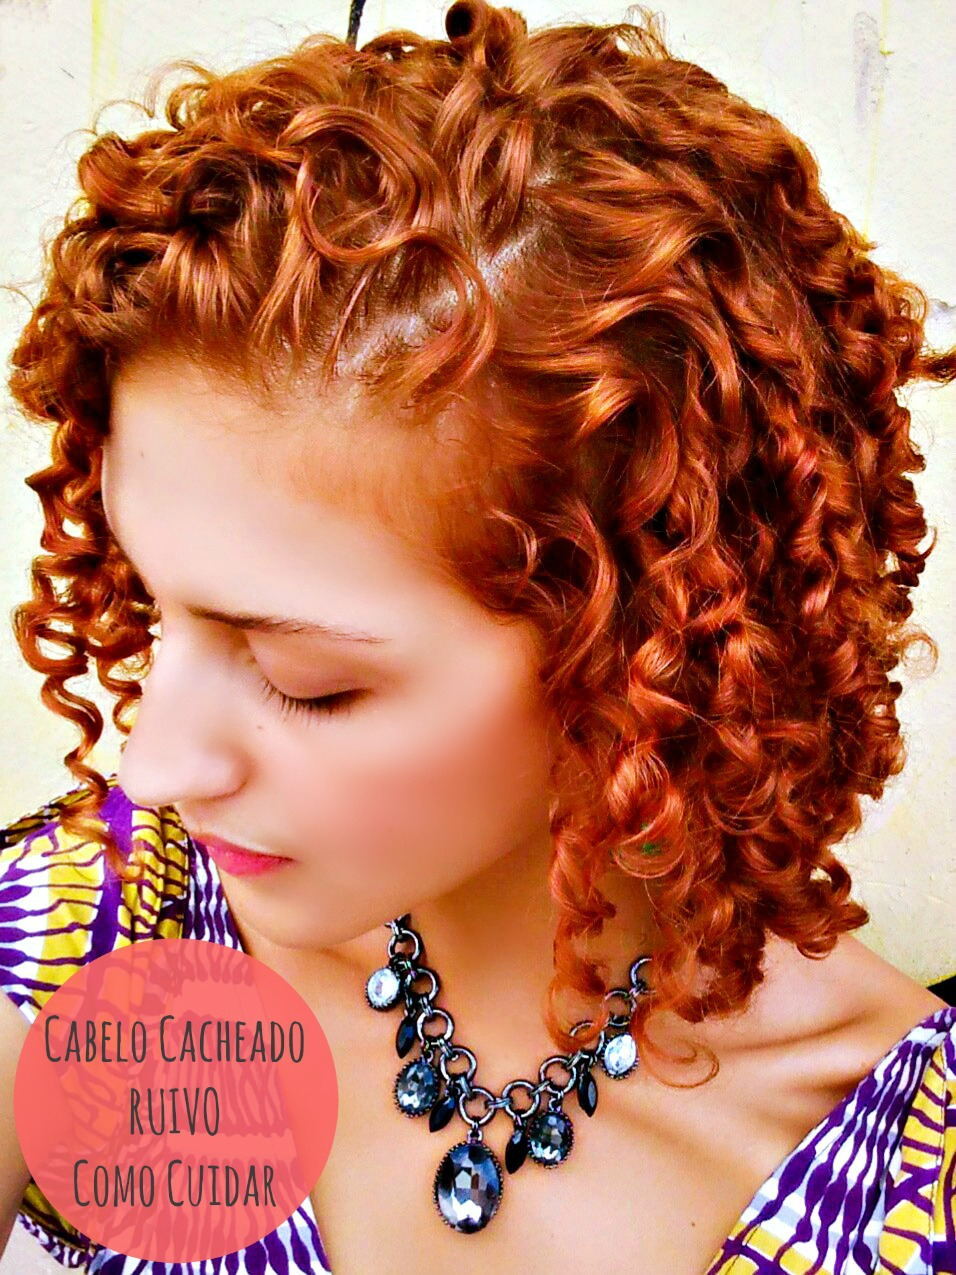 Ruivas Cacheadas Como cuidar de cabelo cacheado ruivo acobreado Karina Viega